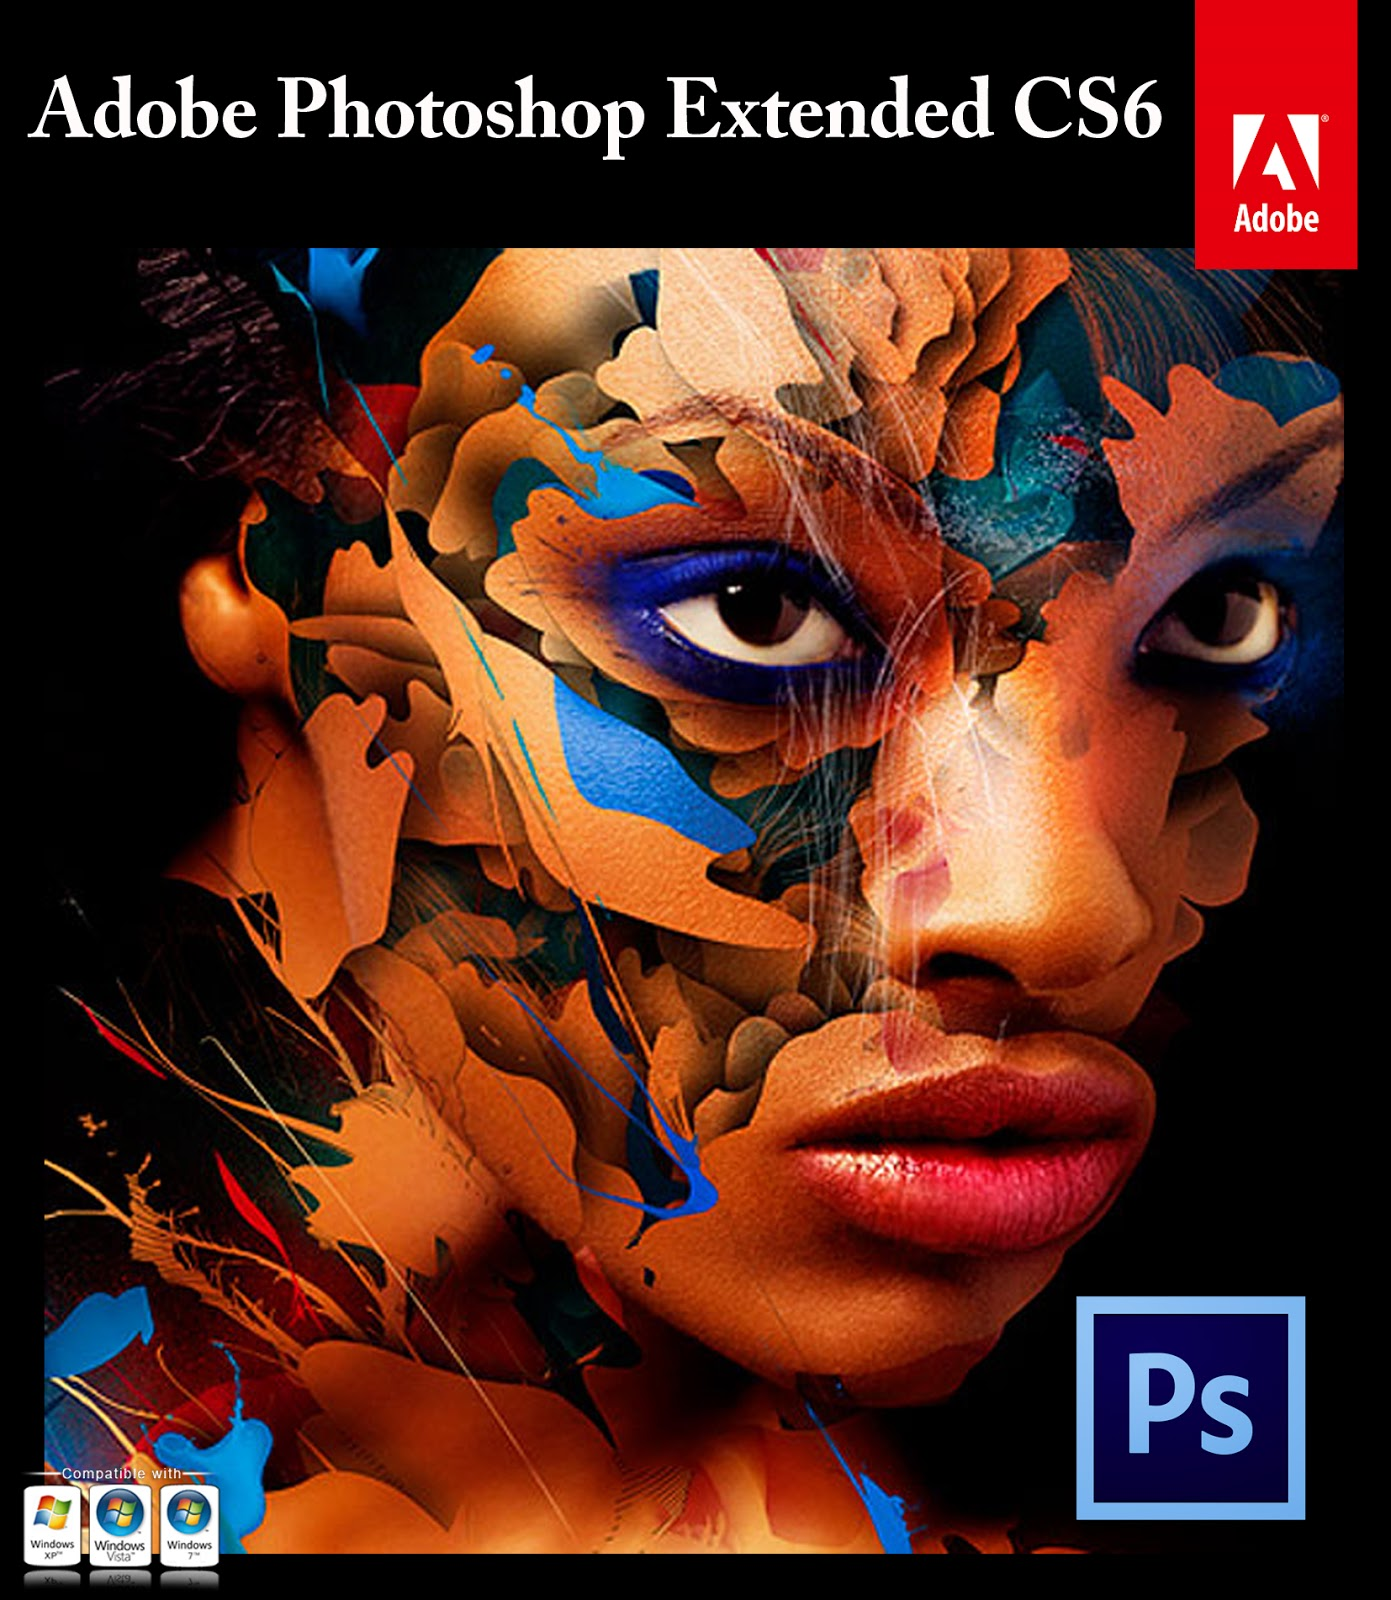 adobe photoshop cs6 download free windows 10